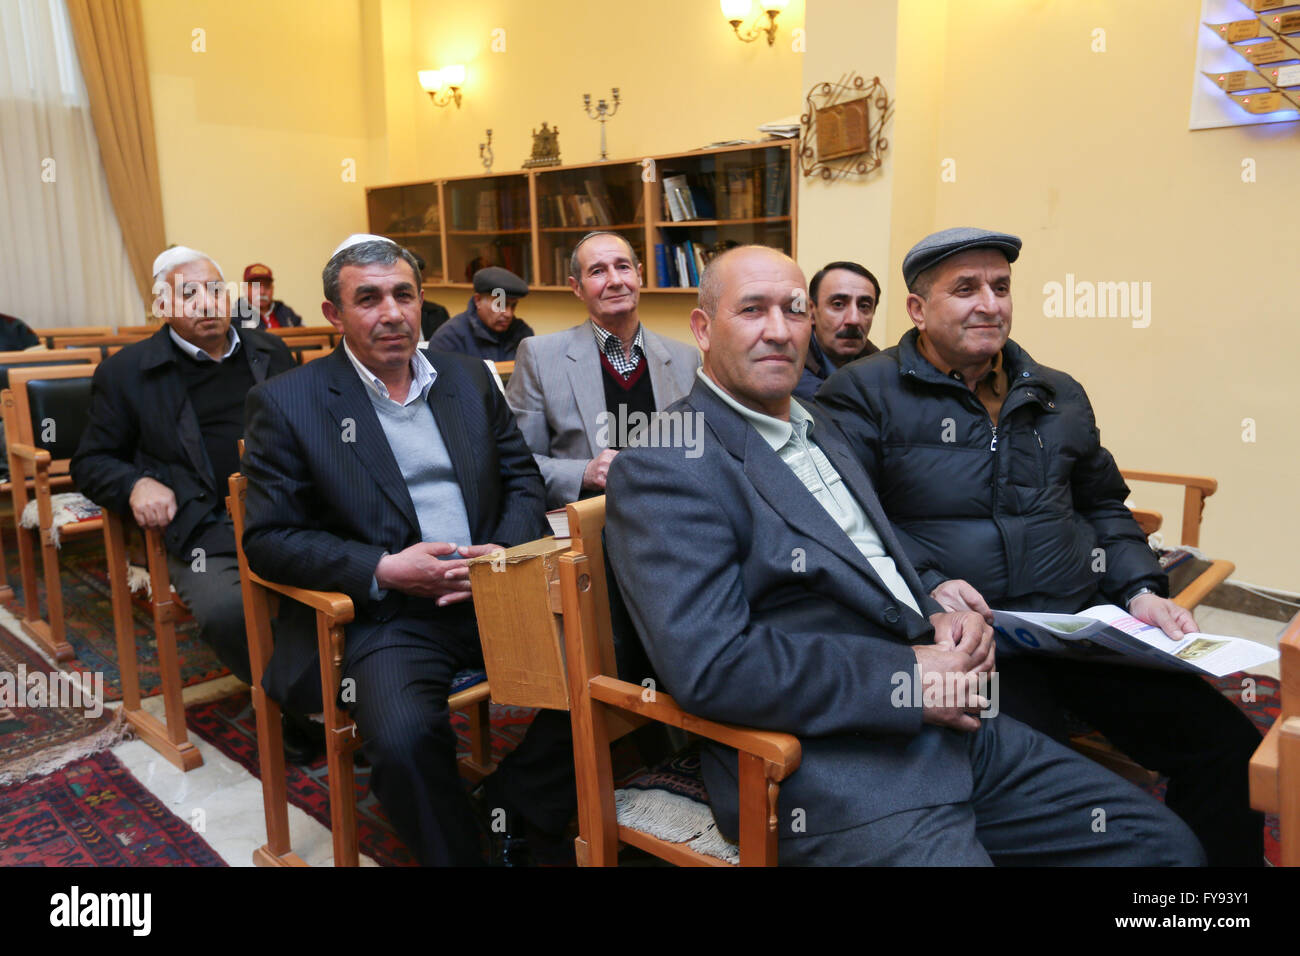 Baku, Azerbaijan. 22nd Apr, 2016. Members of the Mountain Jews gathering at a Synagogue. Mountain Jews speak their - Stock Image